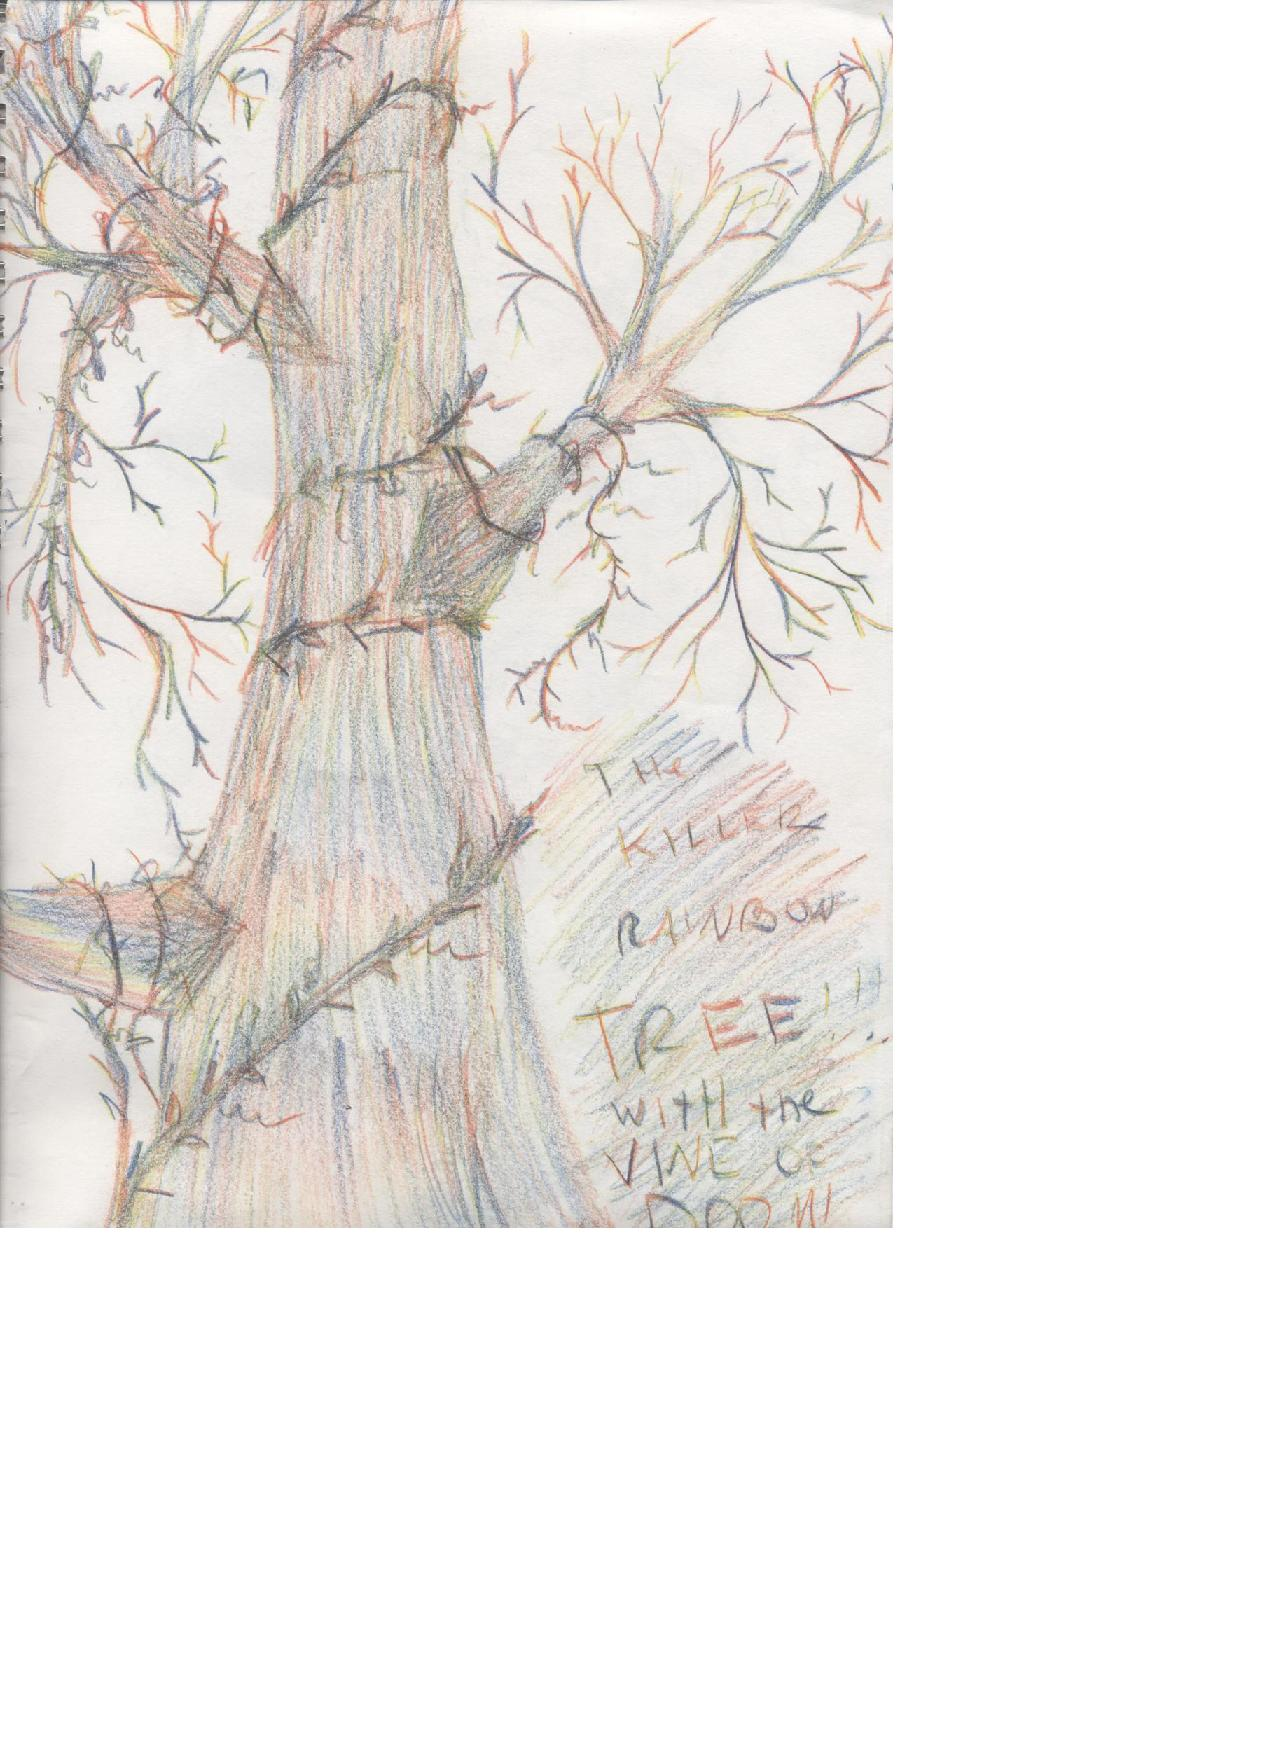 The killer rainbow tree with the vine of doom by CrashAndBurn